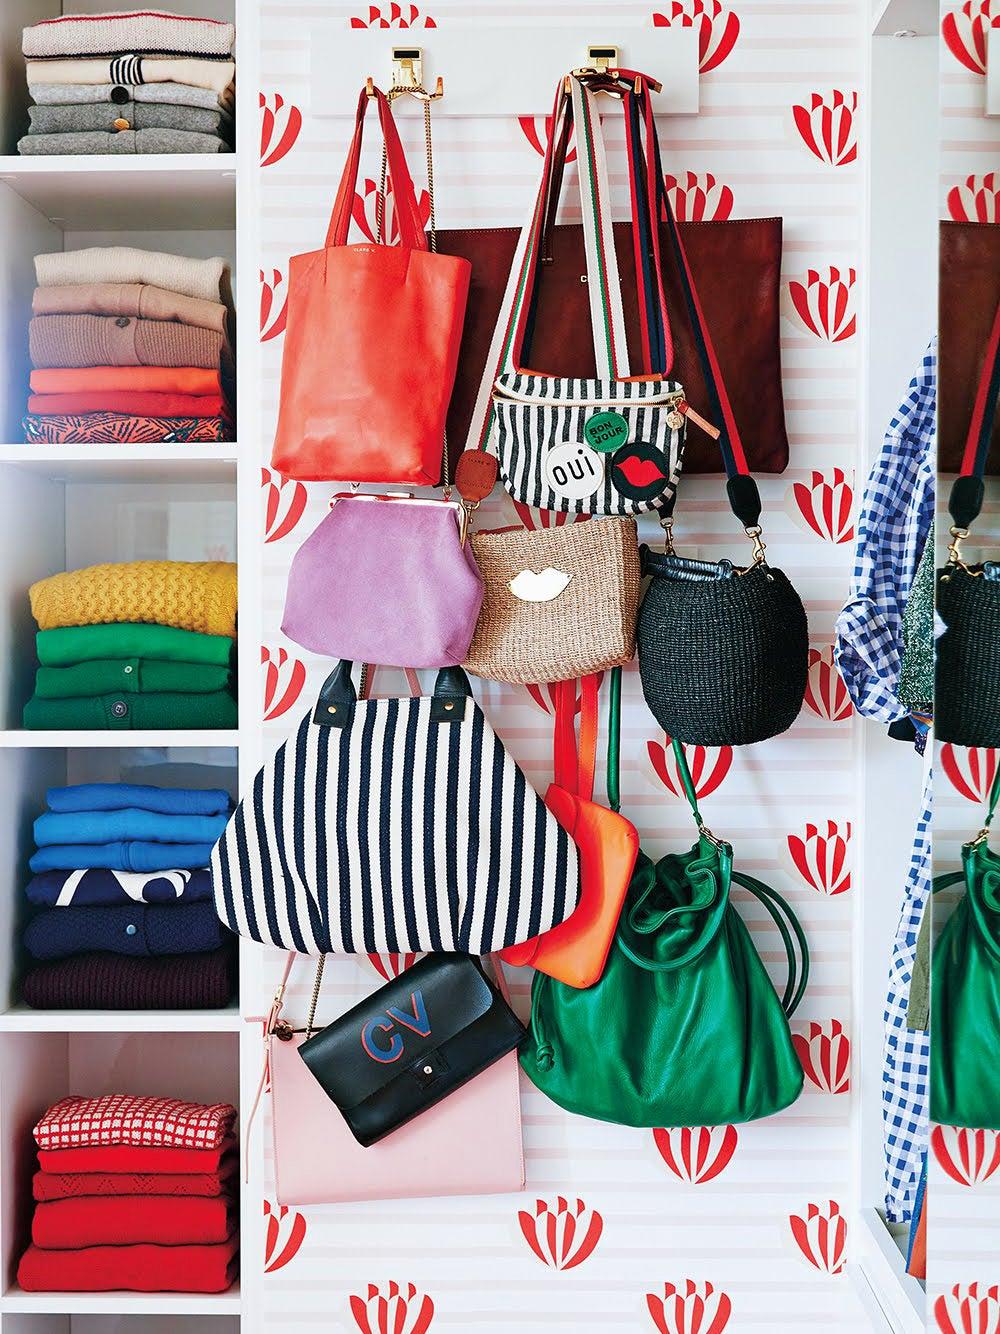 00-FEATURE-fashion-designer-organization-closet-tips-domino